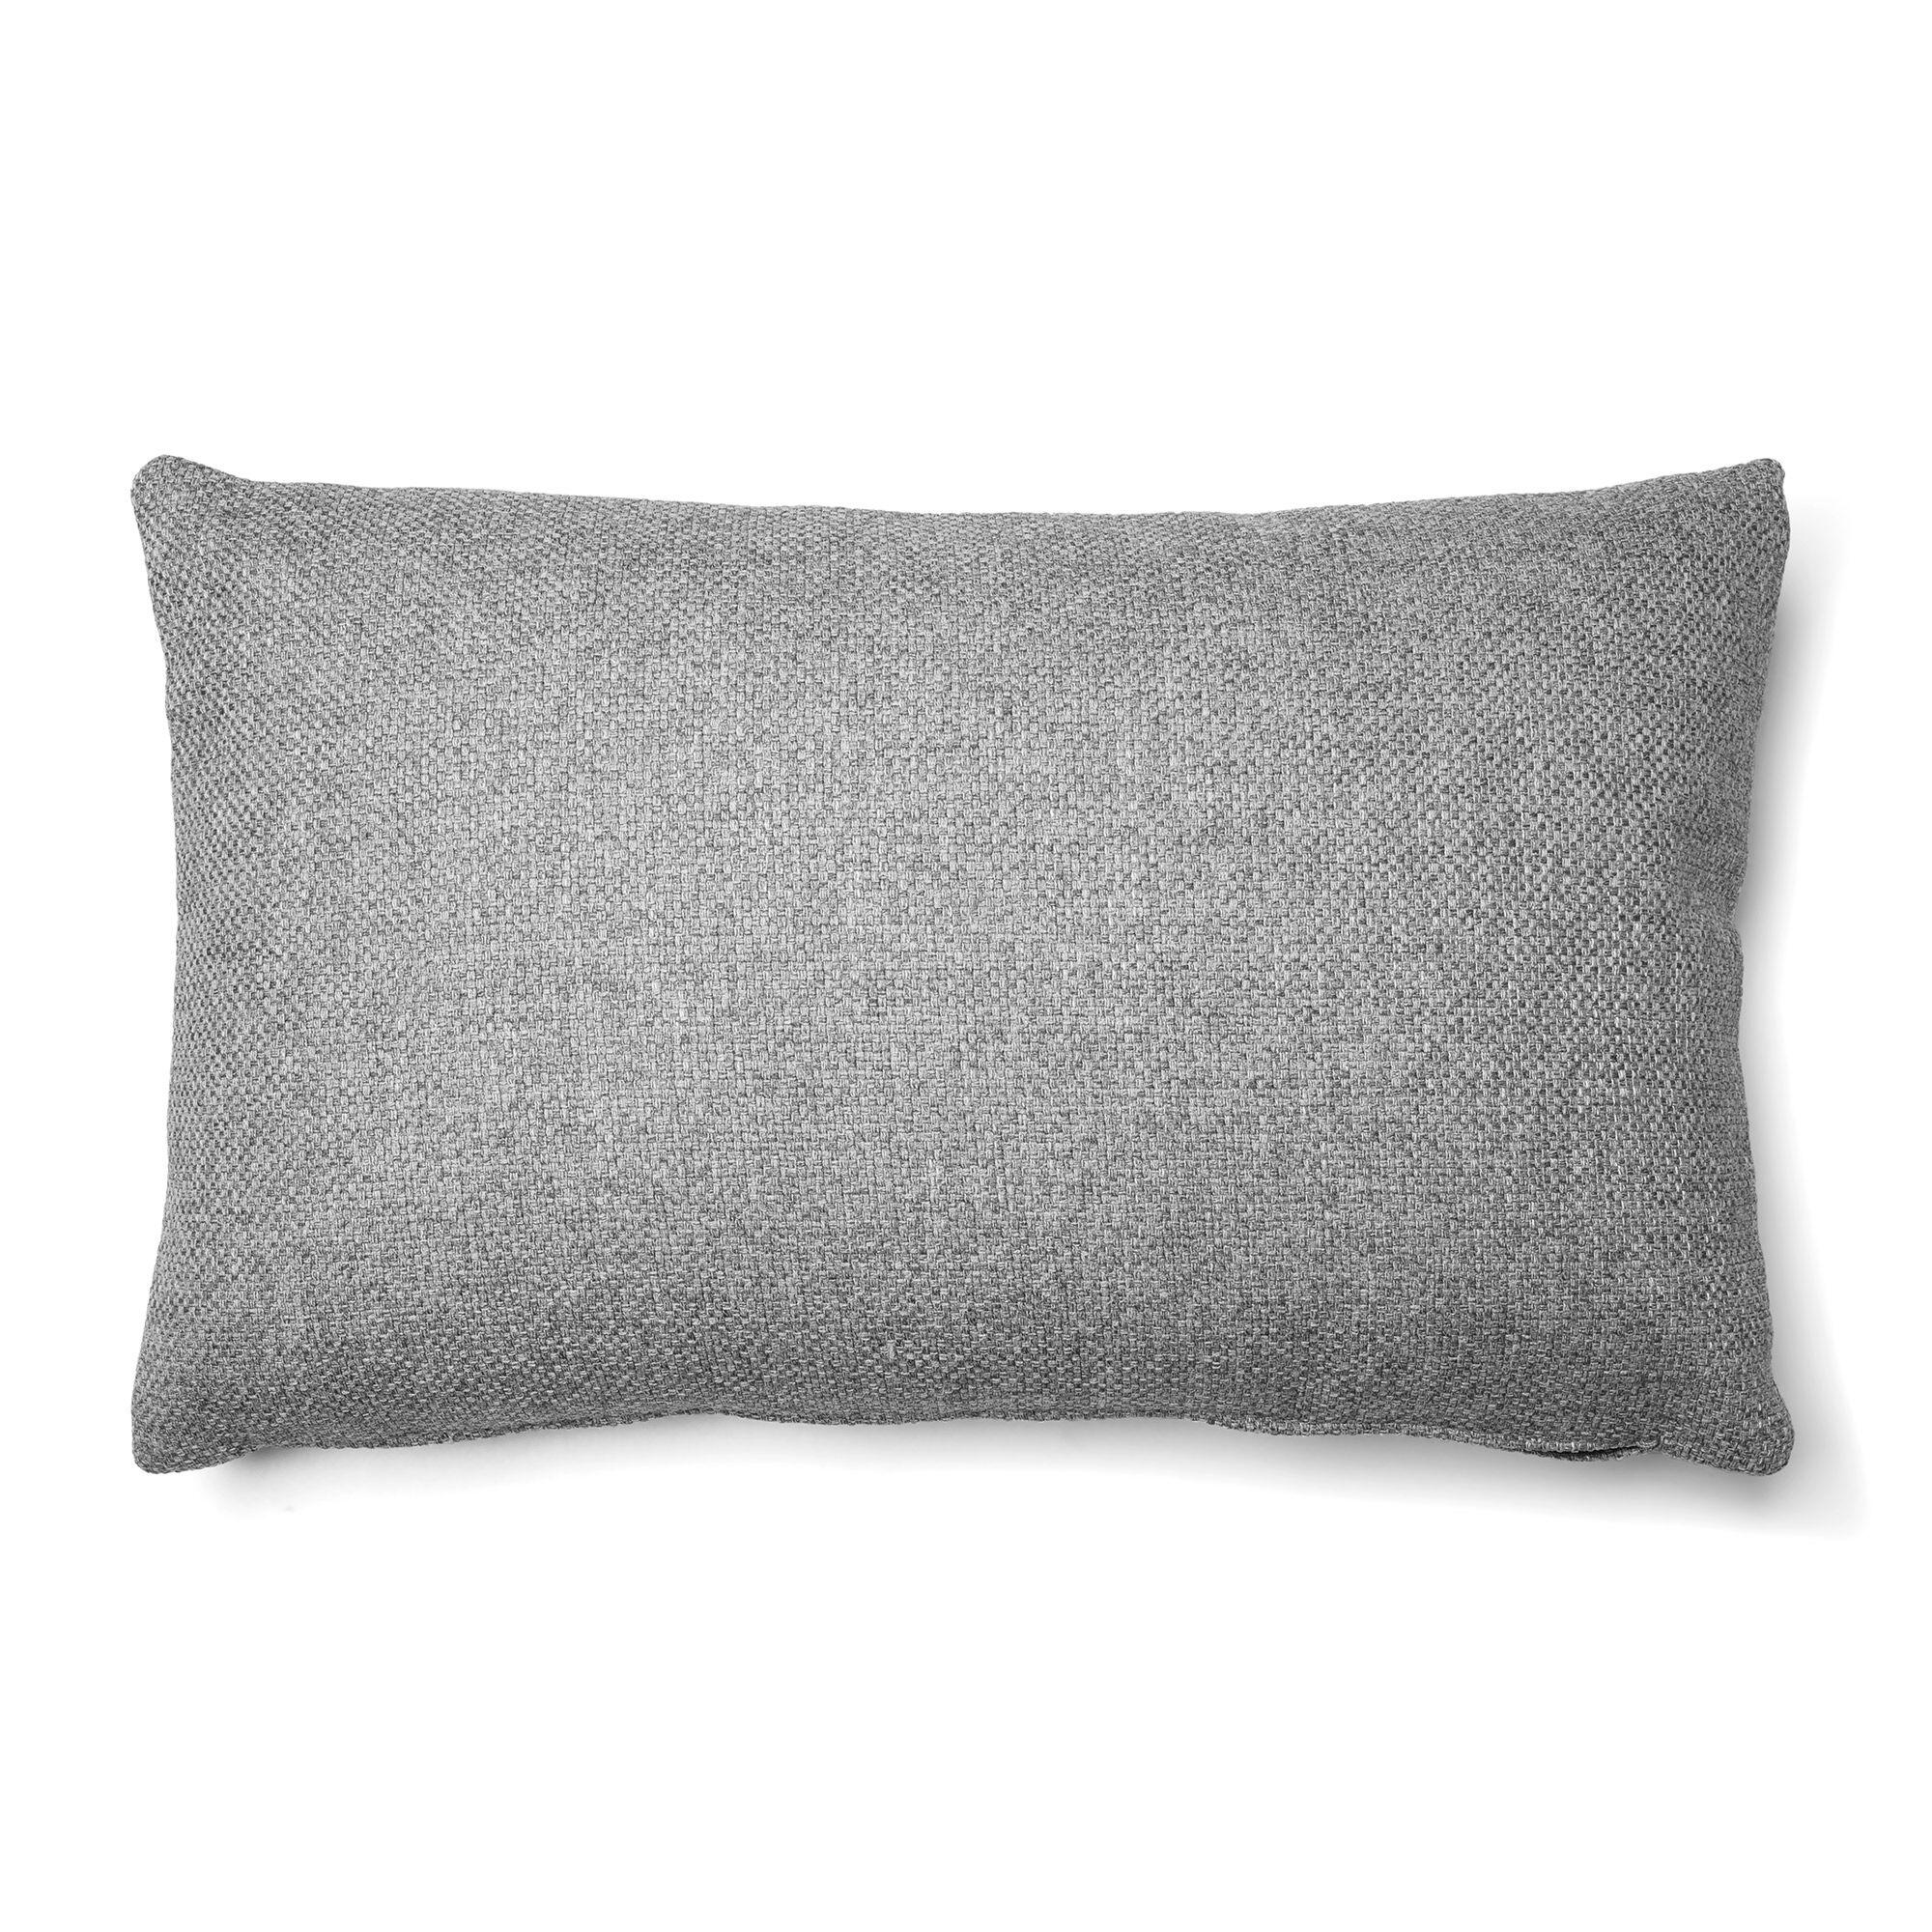 Kave Home Fodera per cuscino Kam 30 x 50 cm chrono grigio chiaro